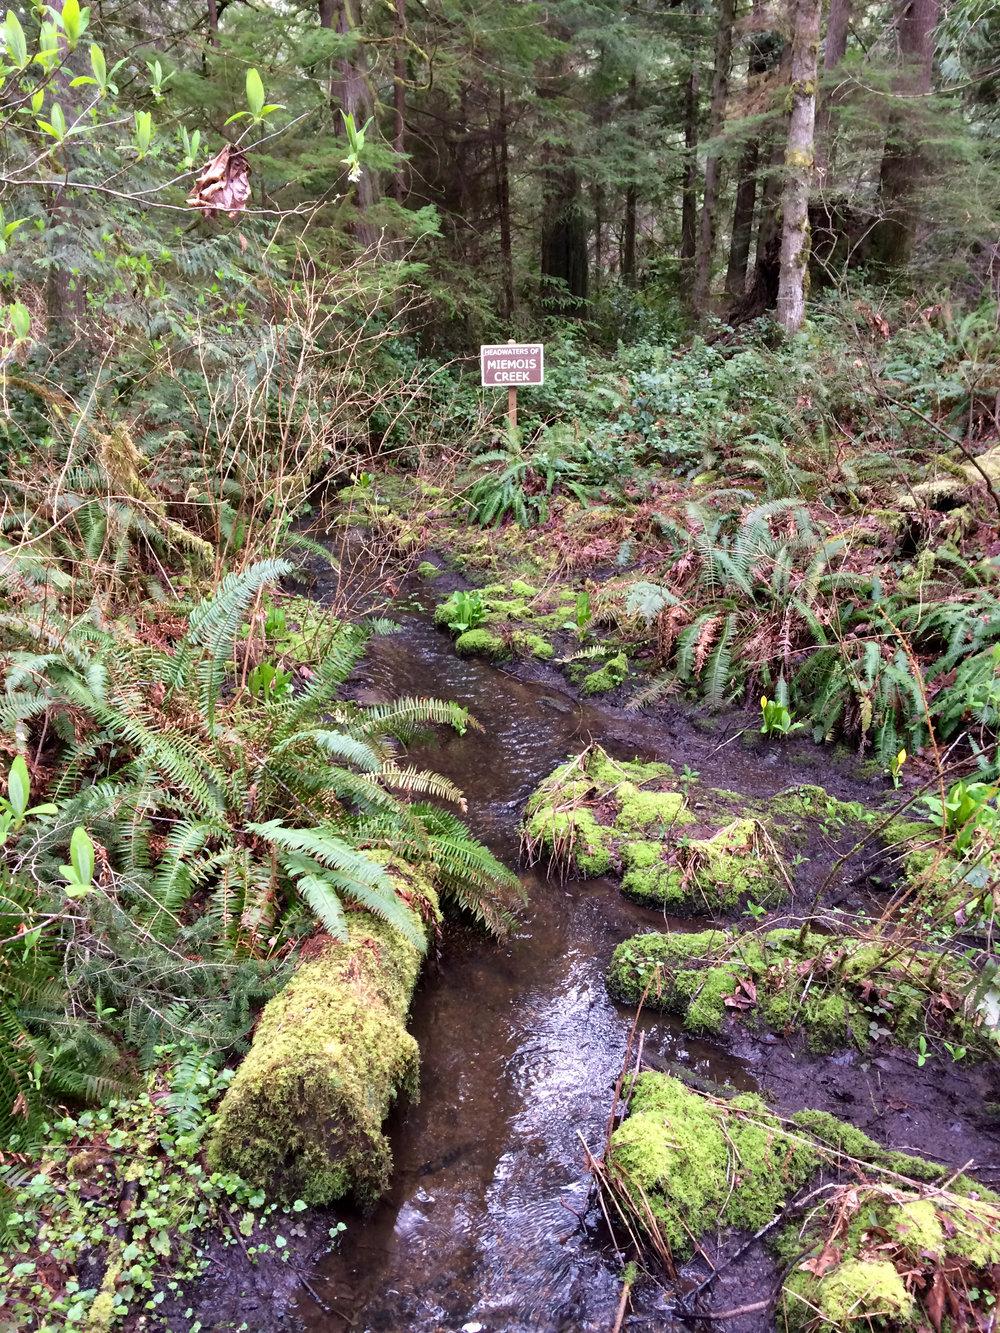 Miemois Creek, Grand Forest, Bainbridge Island